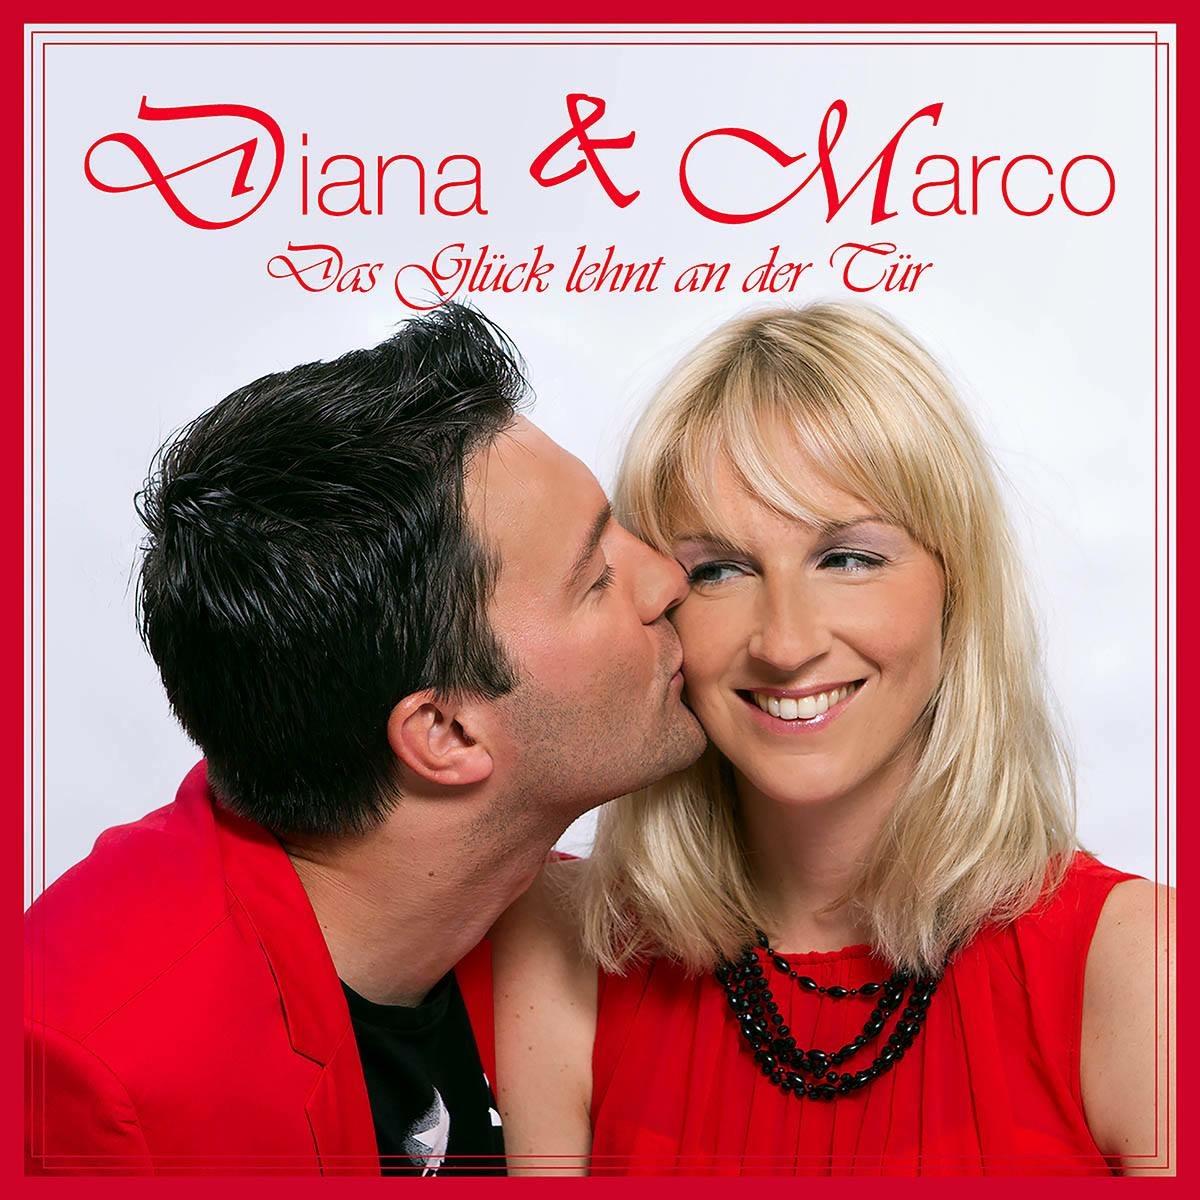 Diana & Marco-das Glück lehnt an der Tür